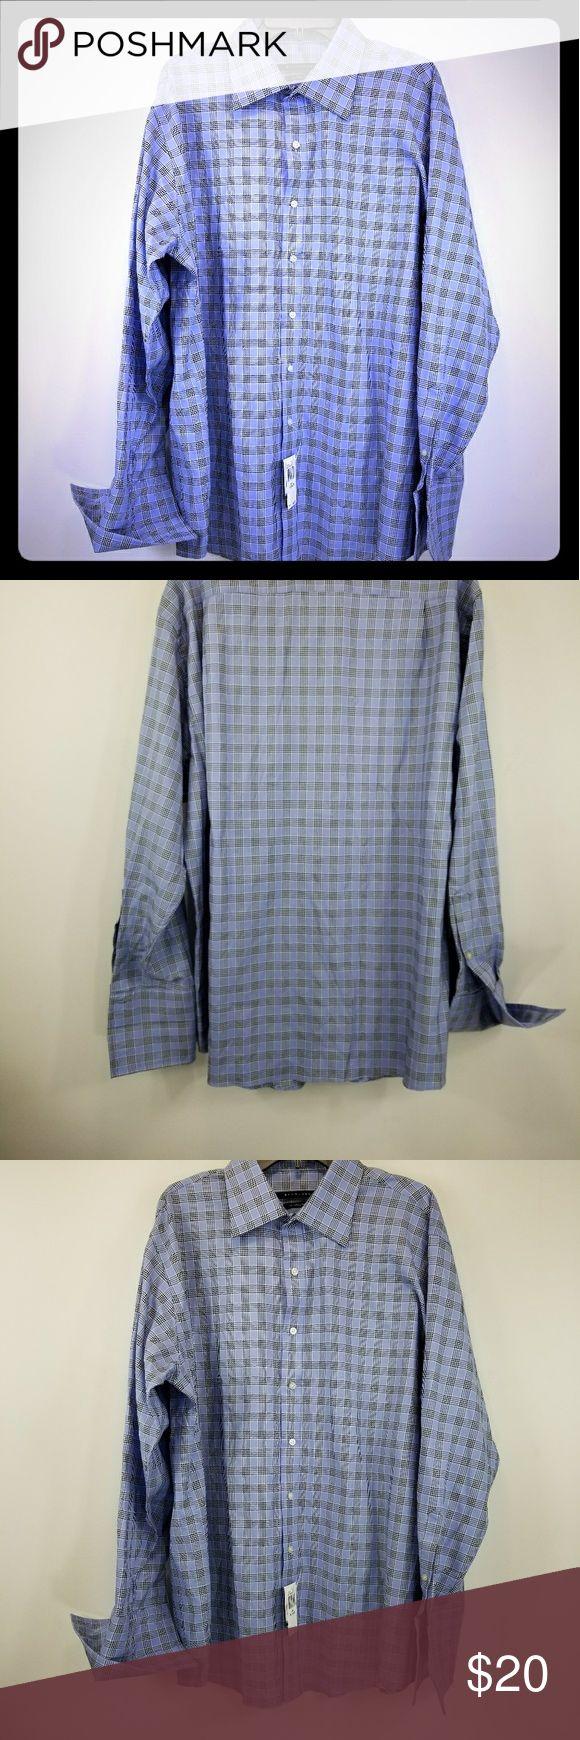 Sean John Blue Checkered XL Dress Shirt NWT 18 This is New With Tags Sean John Blue Checkered Tailored Fit dress shirt. Does not come with cufflinks. The size is XL 18 34/35. New with Tags Sean John Shirts Dress Shirts